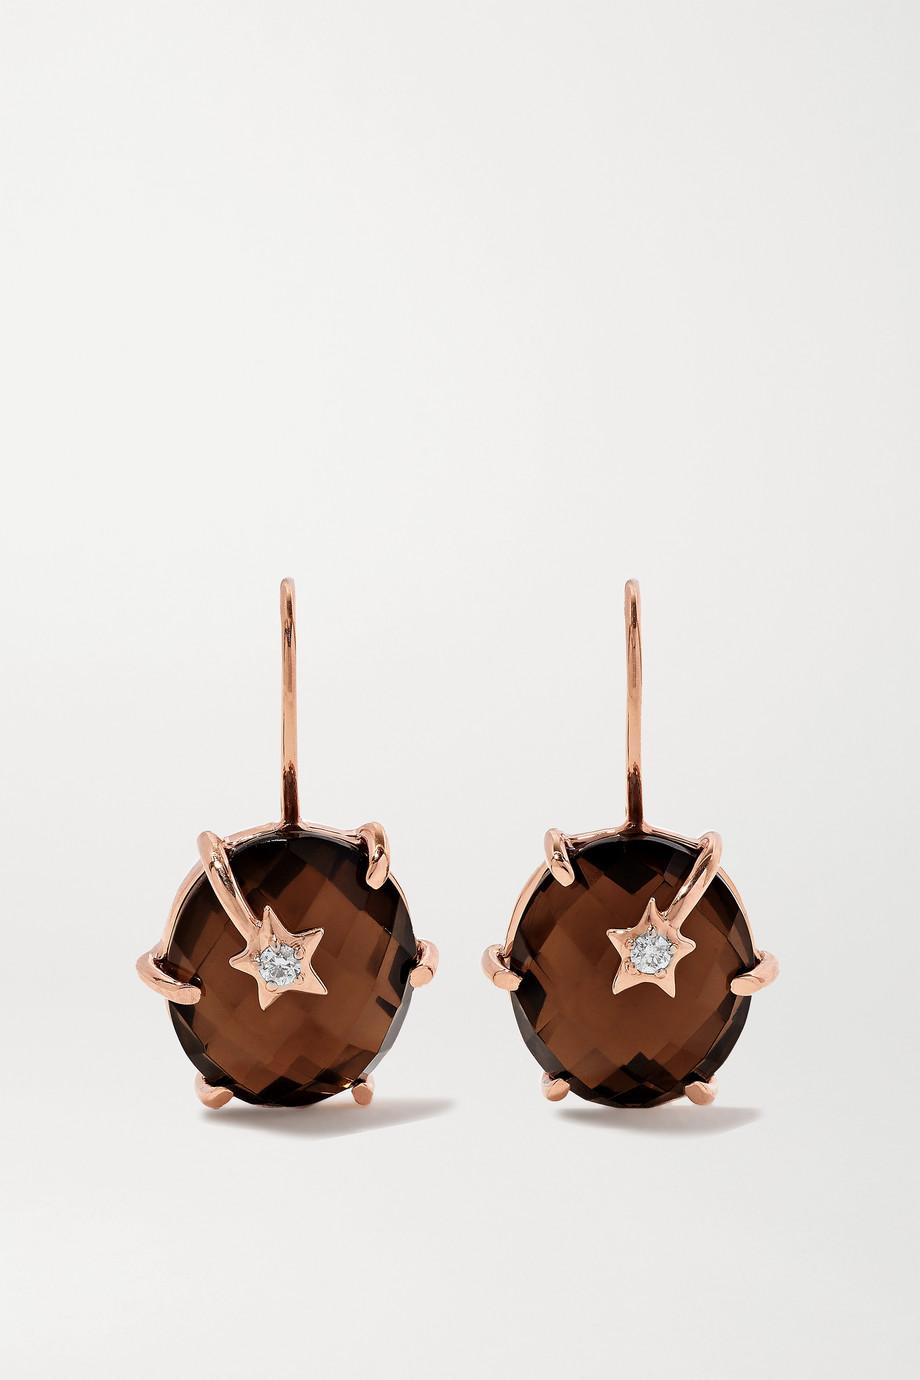 Andrea Fohrman Mini Galaxy 18-karat rose gold, quartz and diamond earrings